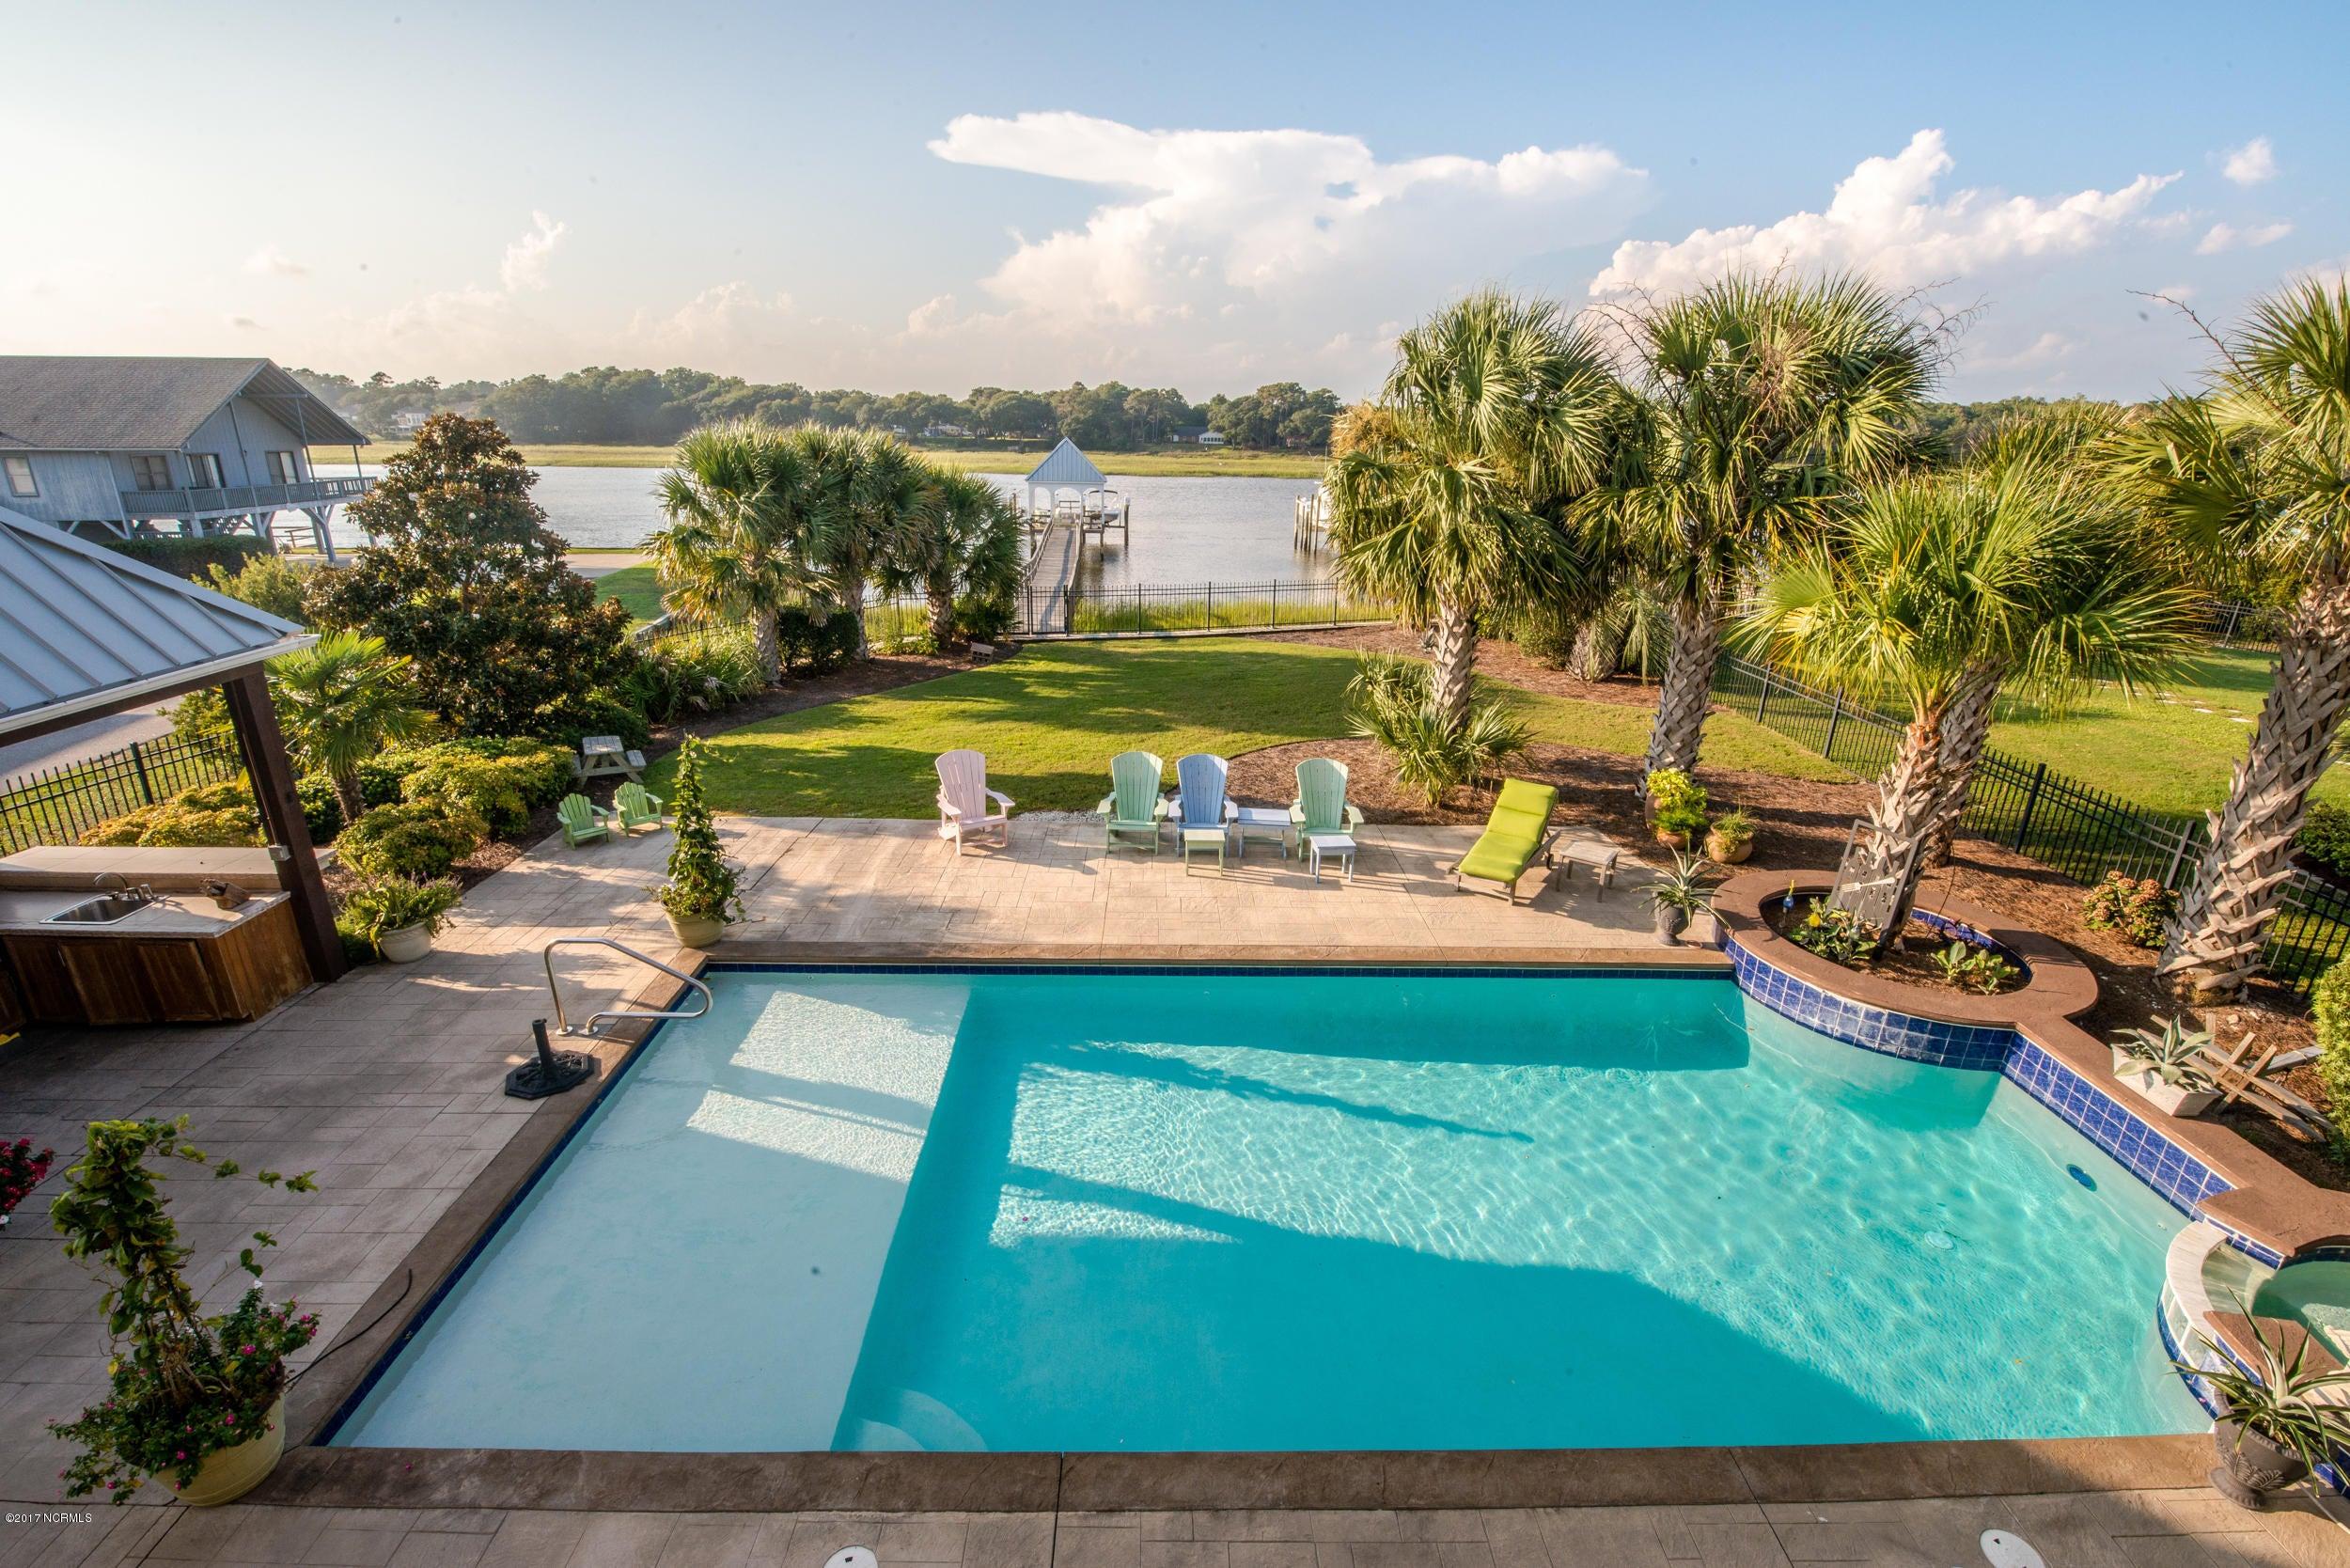 Ocean Isle Beach Real Estate - http://cdn.resize.sparkplatform.com/ncr/1024x768/true/20170829153353706402000000-o.jpg